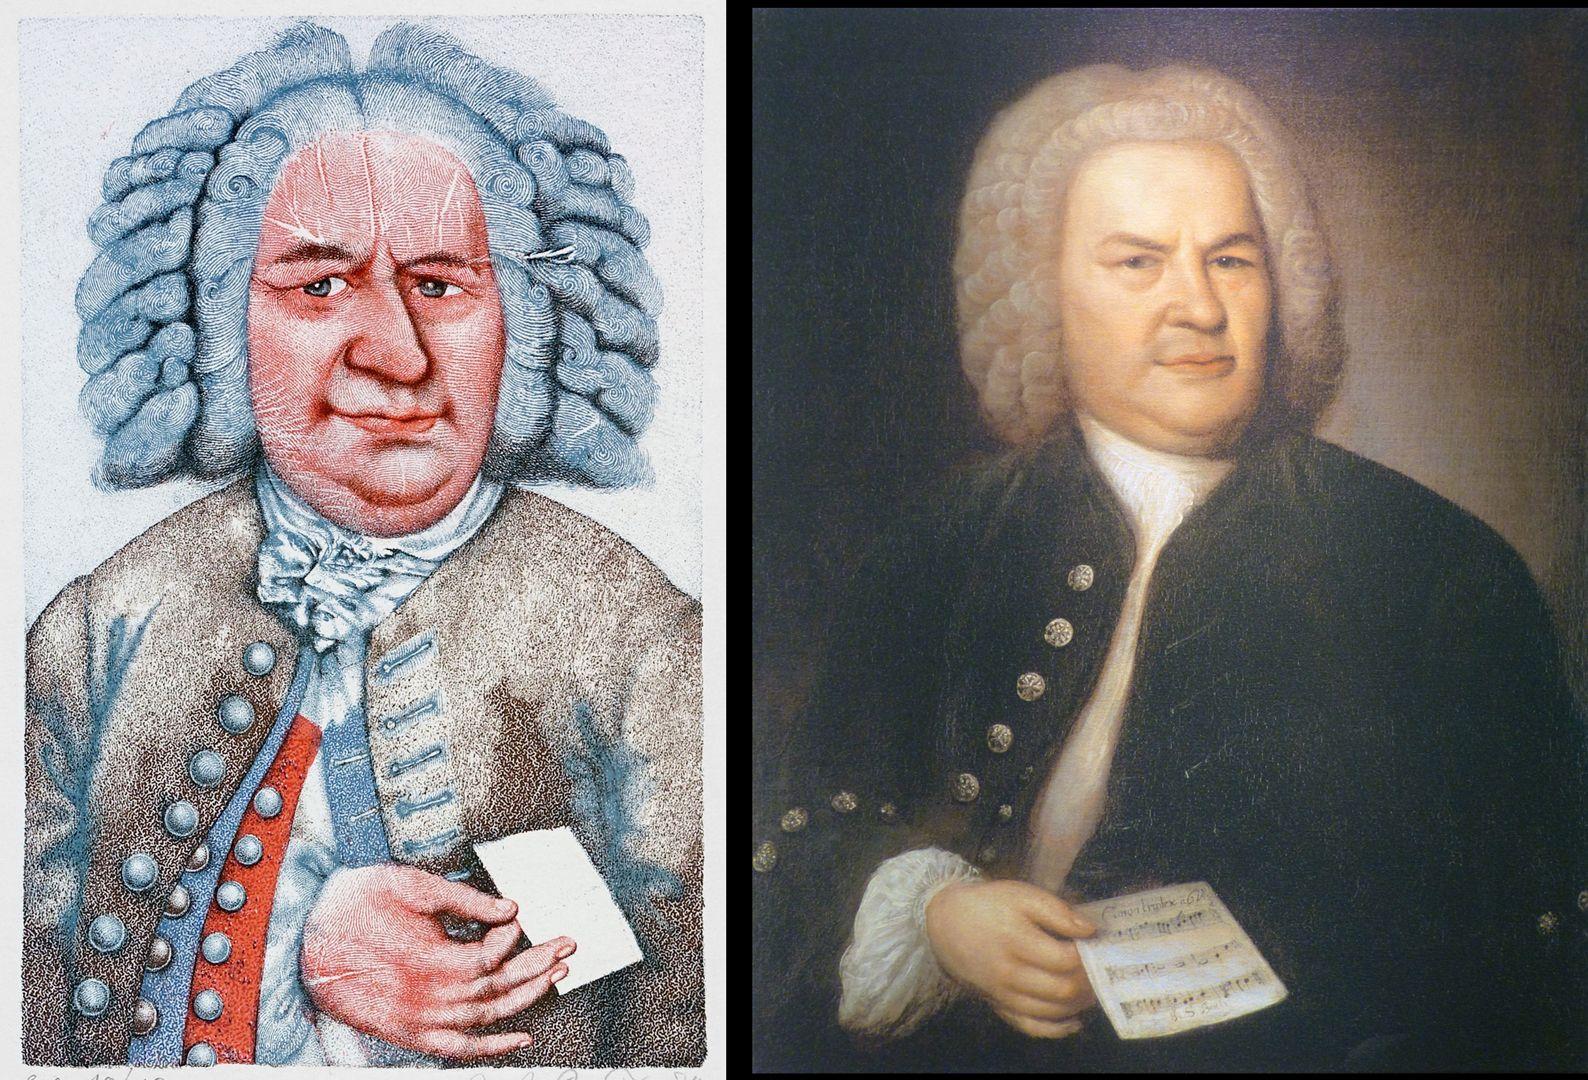 Johann Sebastian Bach Bach by Prechtl and his model by Elias Gottlob Haußmann from 1746